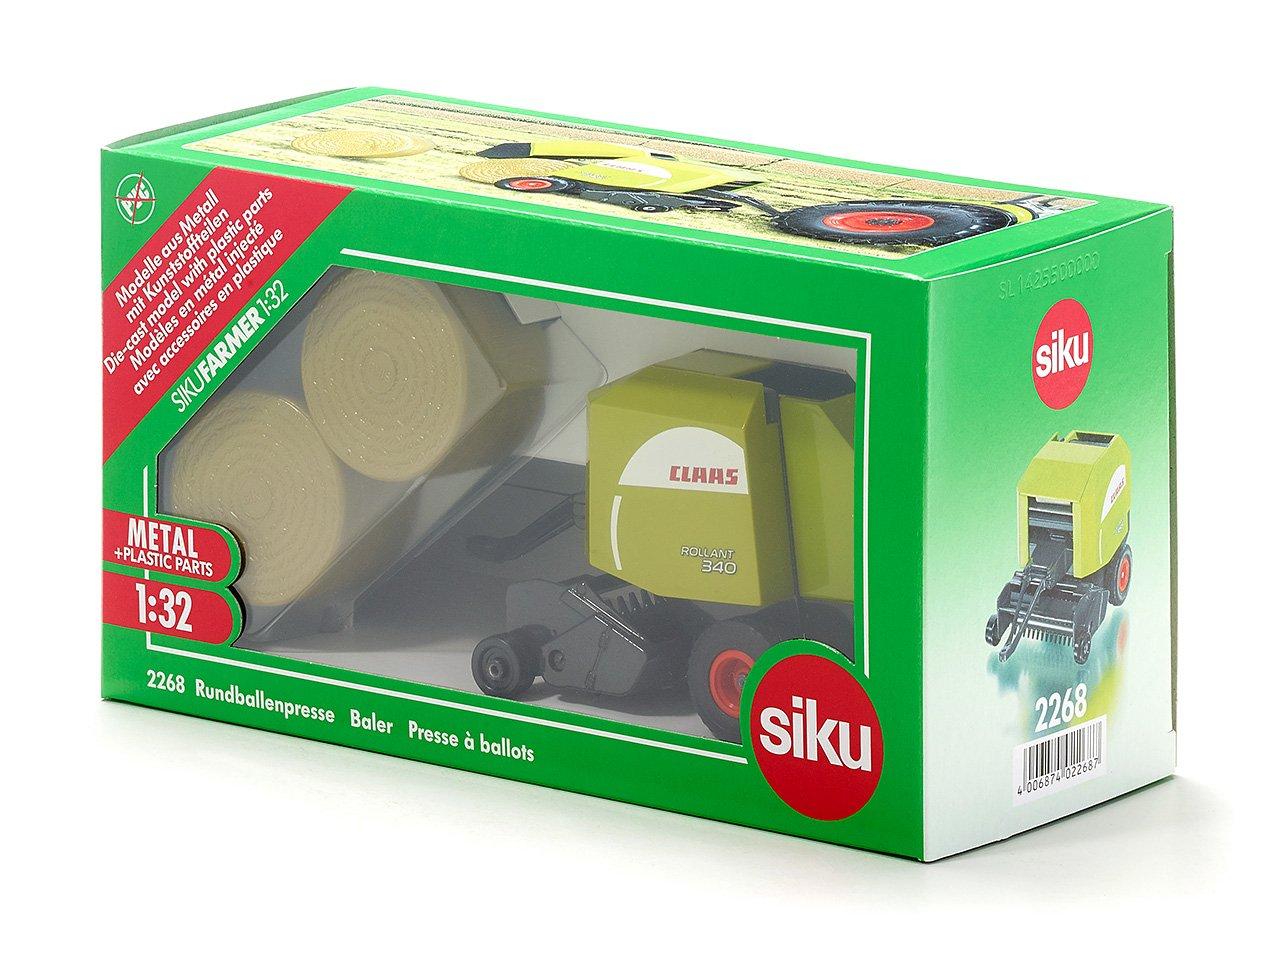 Siku 2268 - Rundballenpresse: Amazon.de: Spielzeug